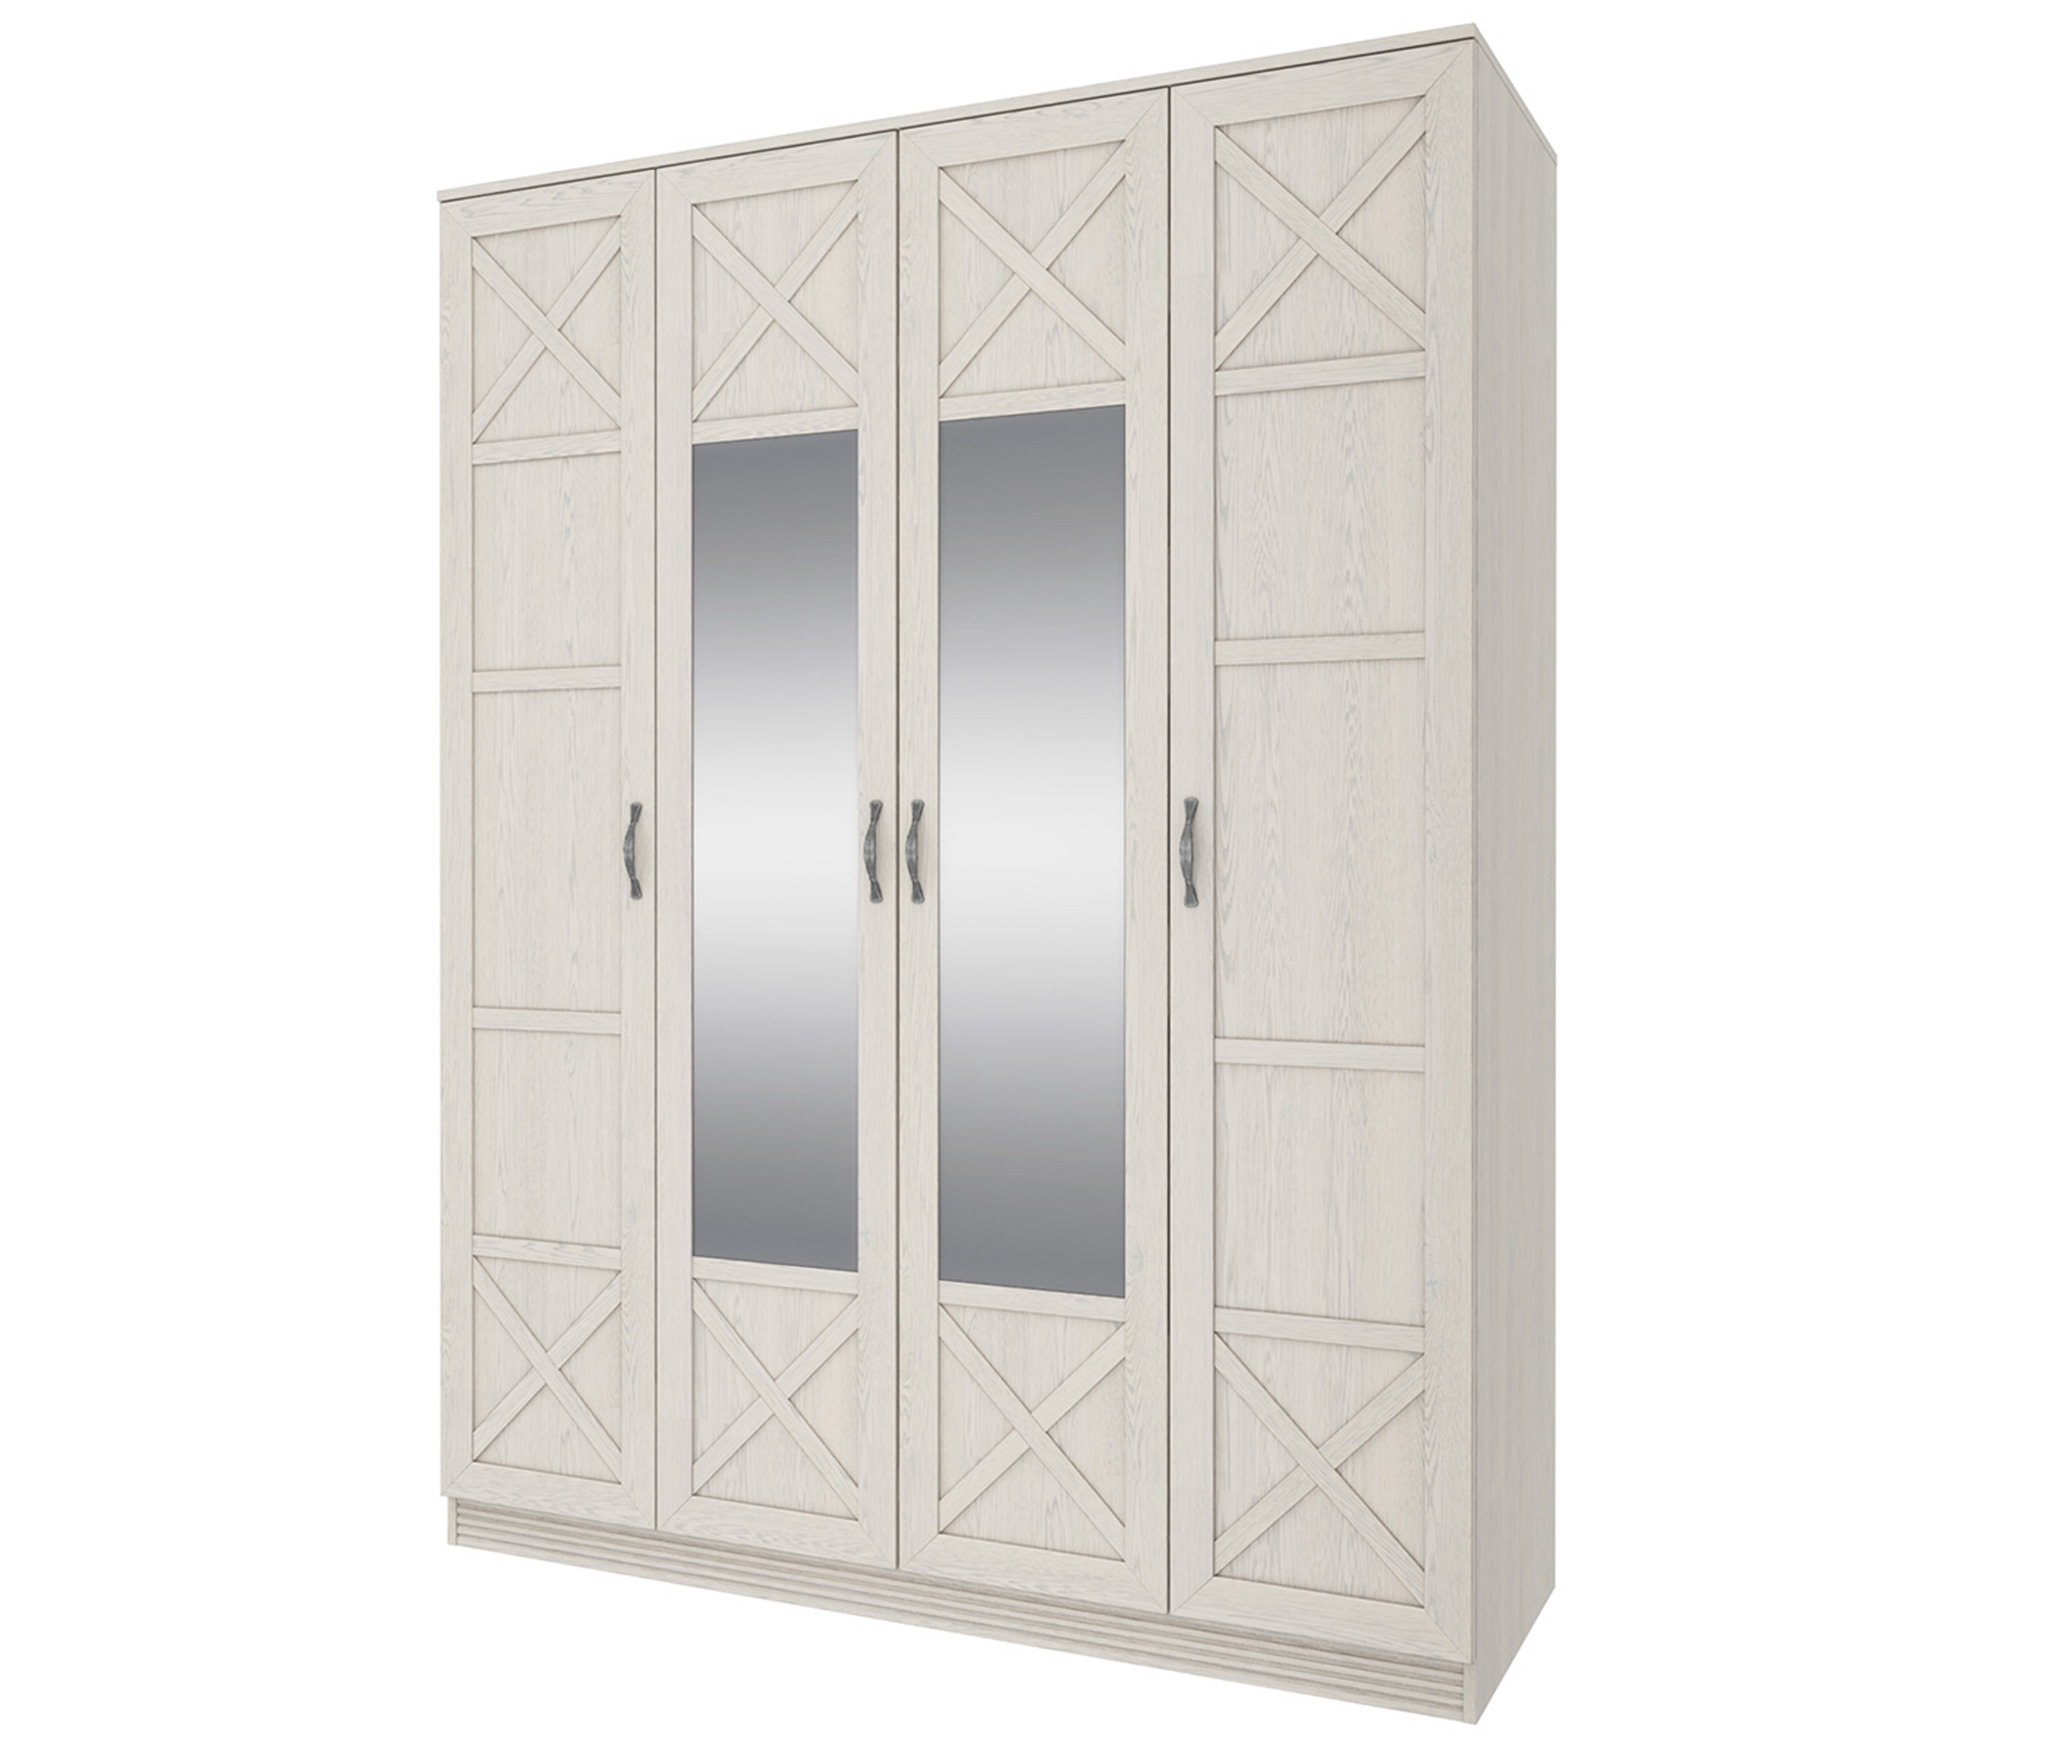 Фото - Лозанна СТЛ.223.01 Шкаф 4 дверный с зеркалом шкаф с зеркалом тифанистл 305 01